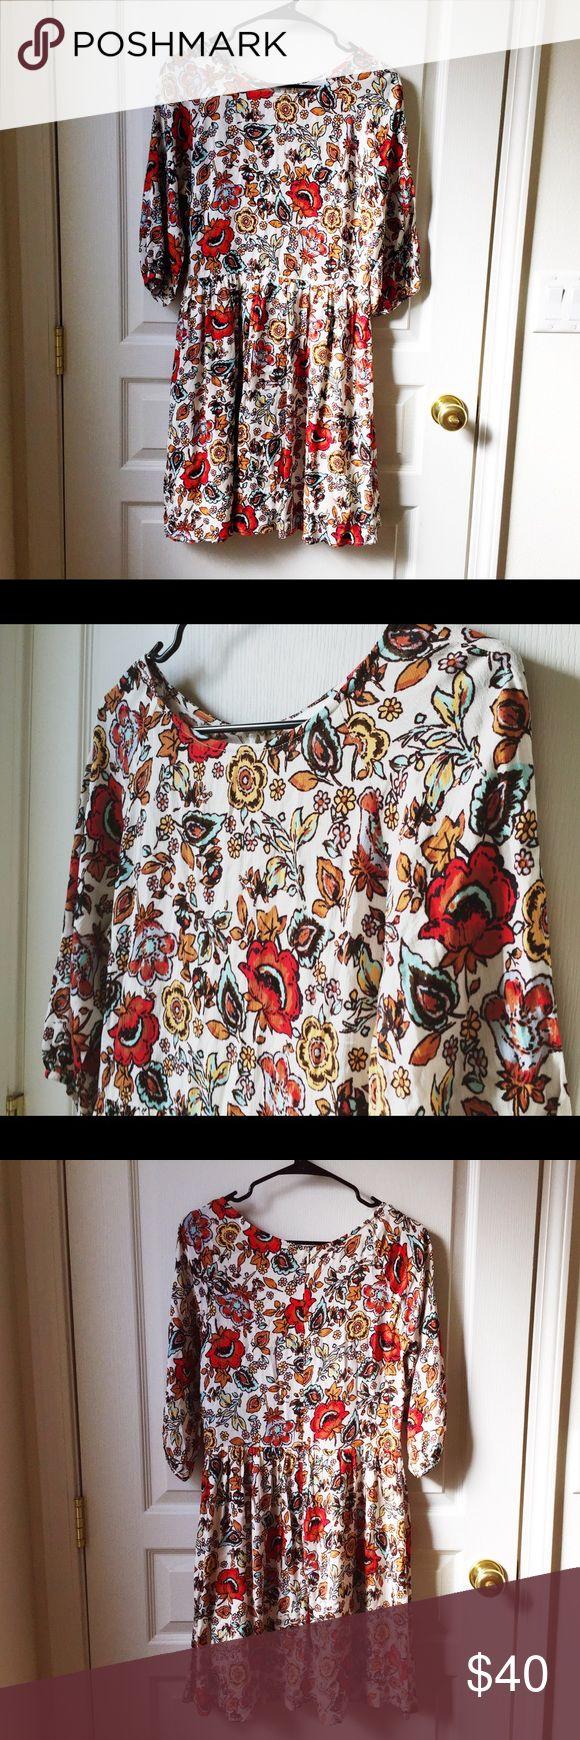 Selling this Modcloth floral boho dress NWOT on Poshmark! My username is: wanderlust83. #shopmycloset #poshmark #fashion #shopping #style #forsale #ModCloth #Dresses & Skirts